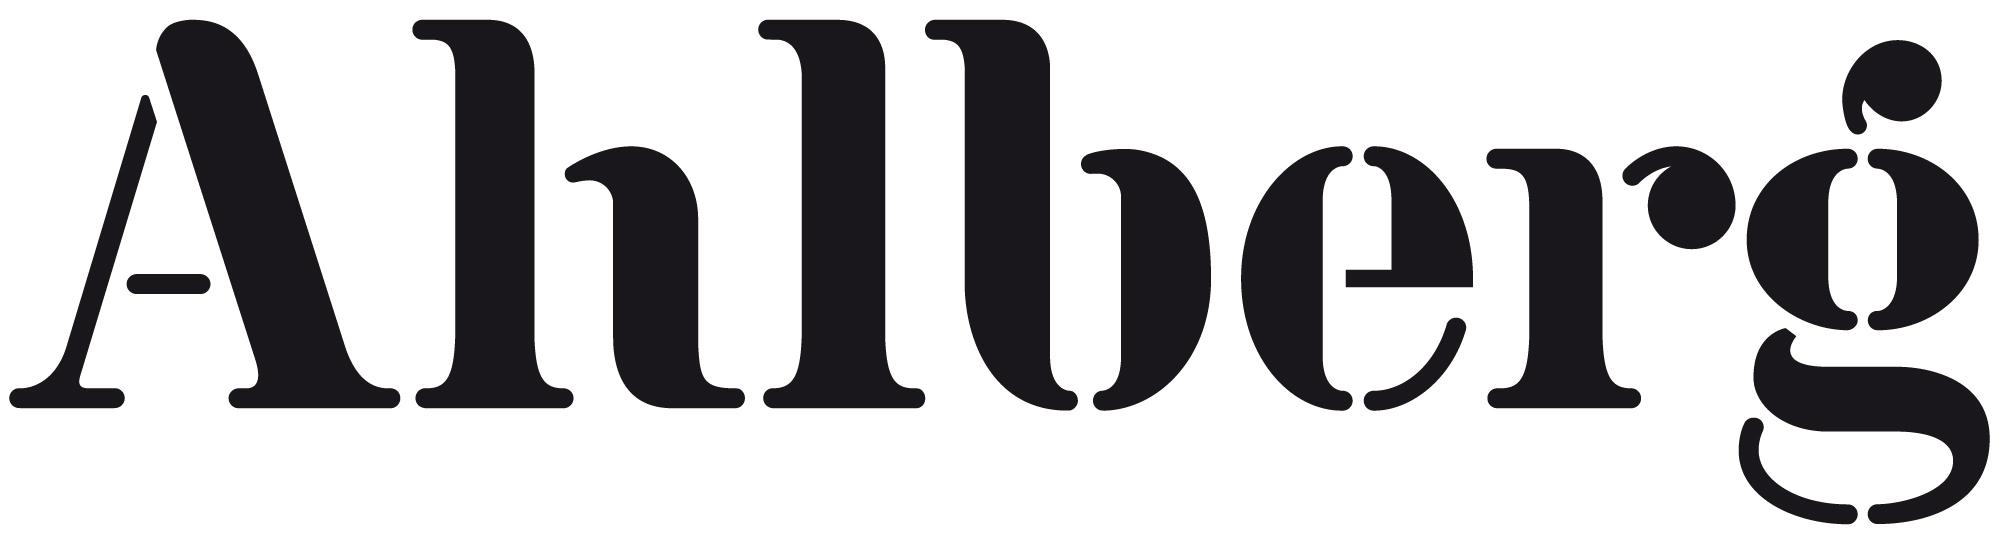 Ahlberg-logo.jpg